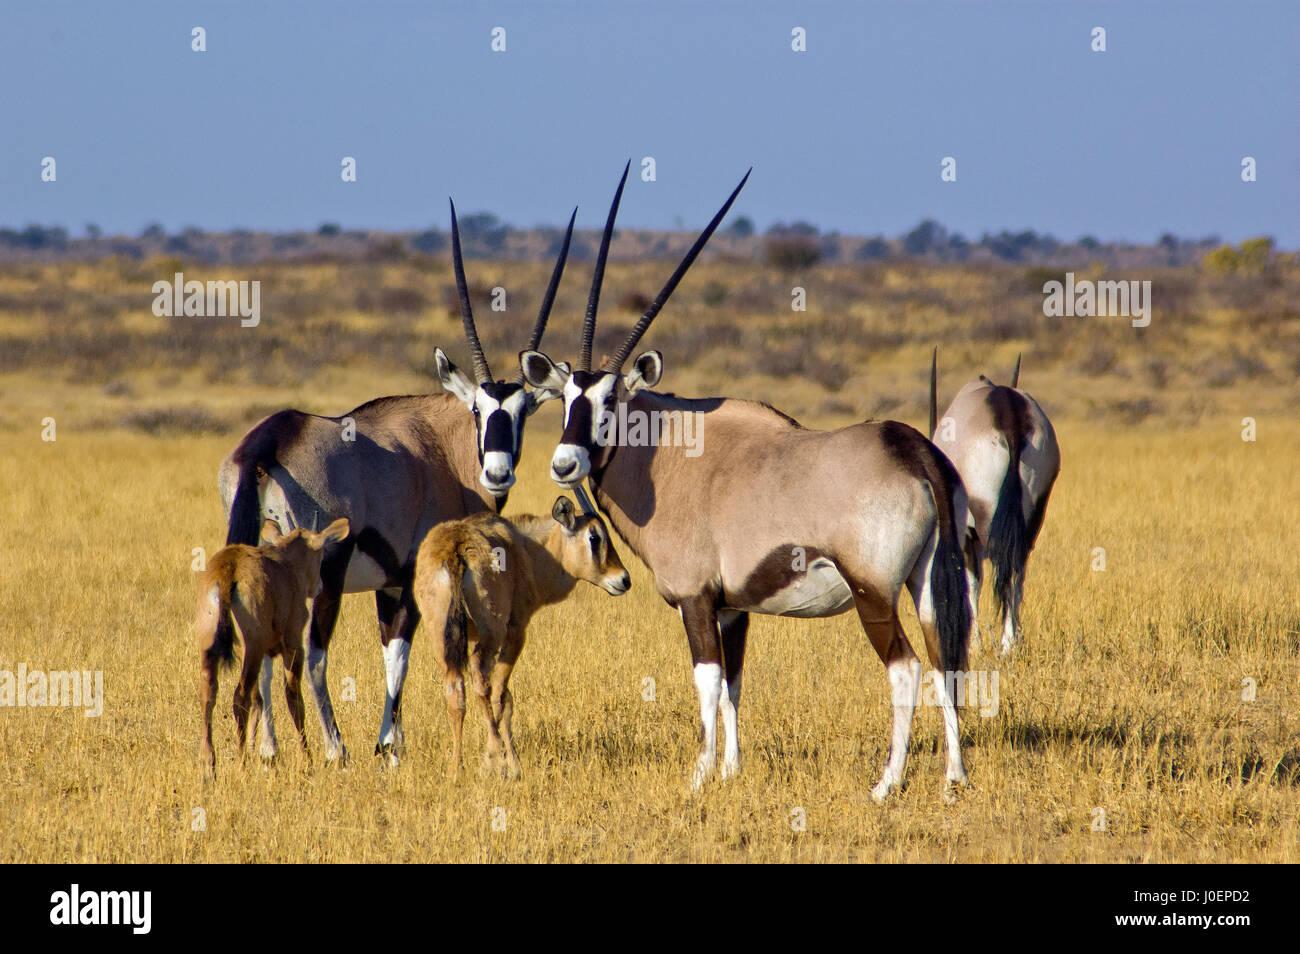 Gemsboks with babies on the open plains at Central Kalahari Game Reserve, Botswana - Stock Image